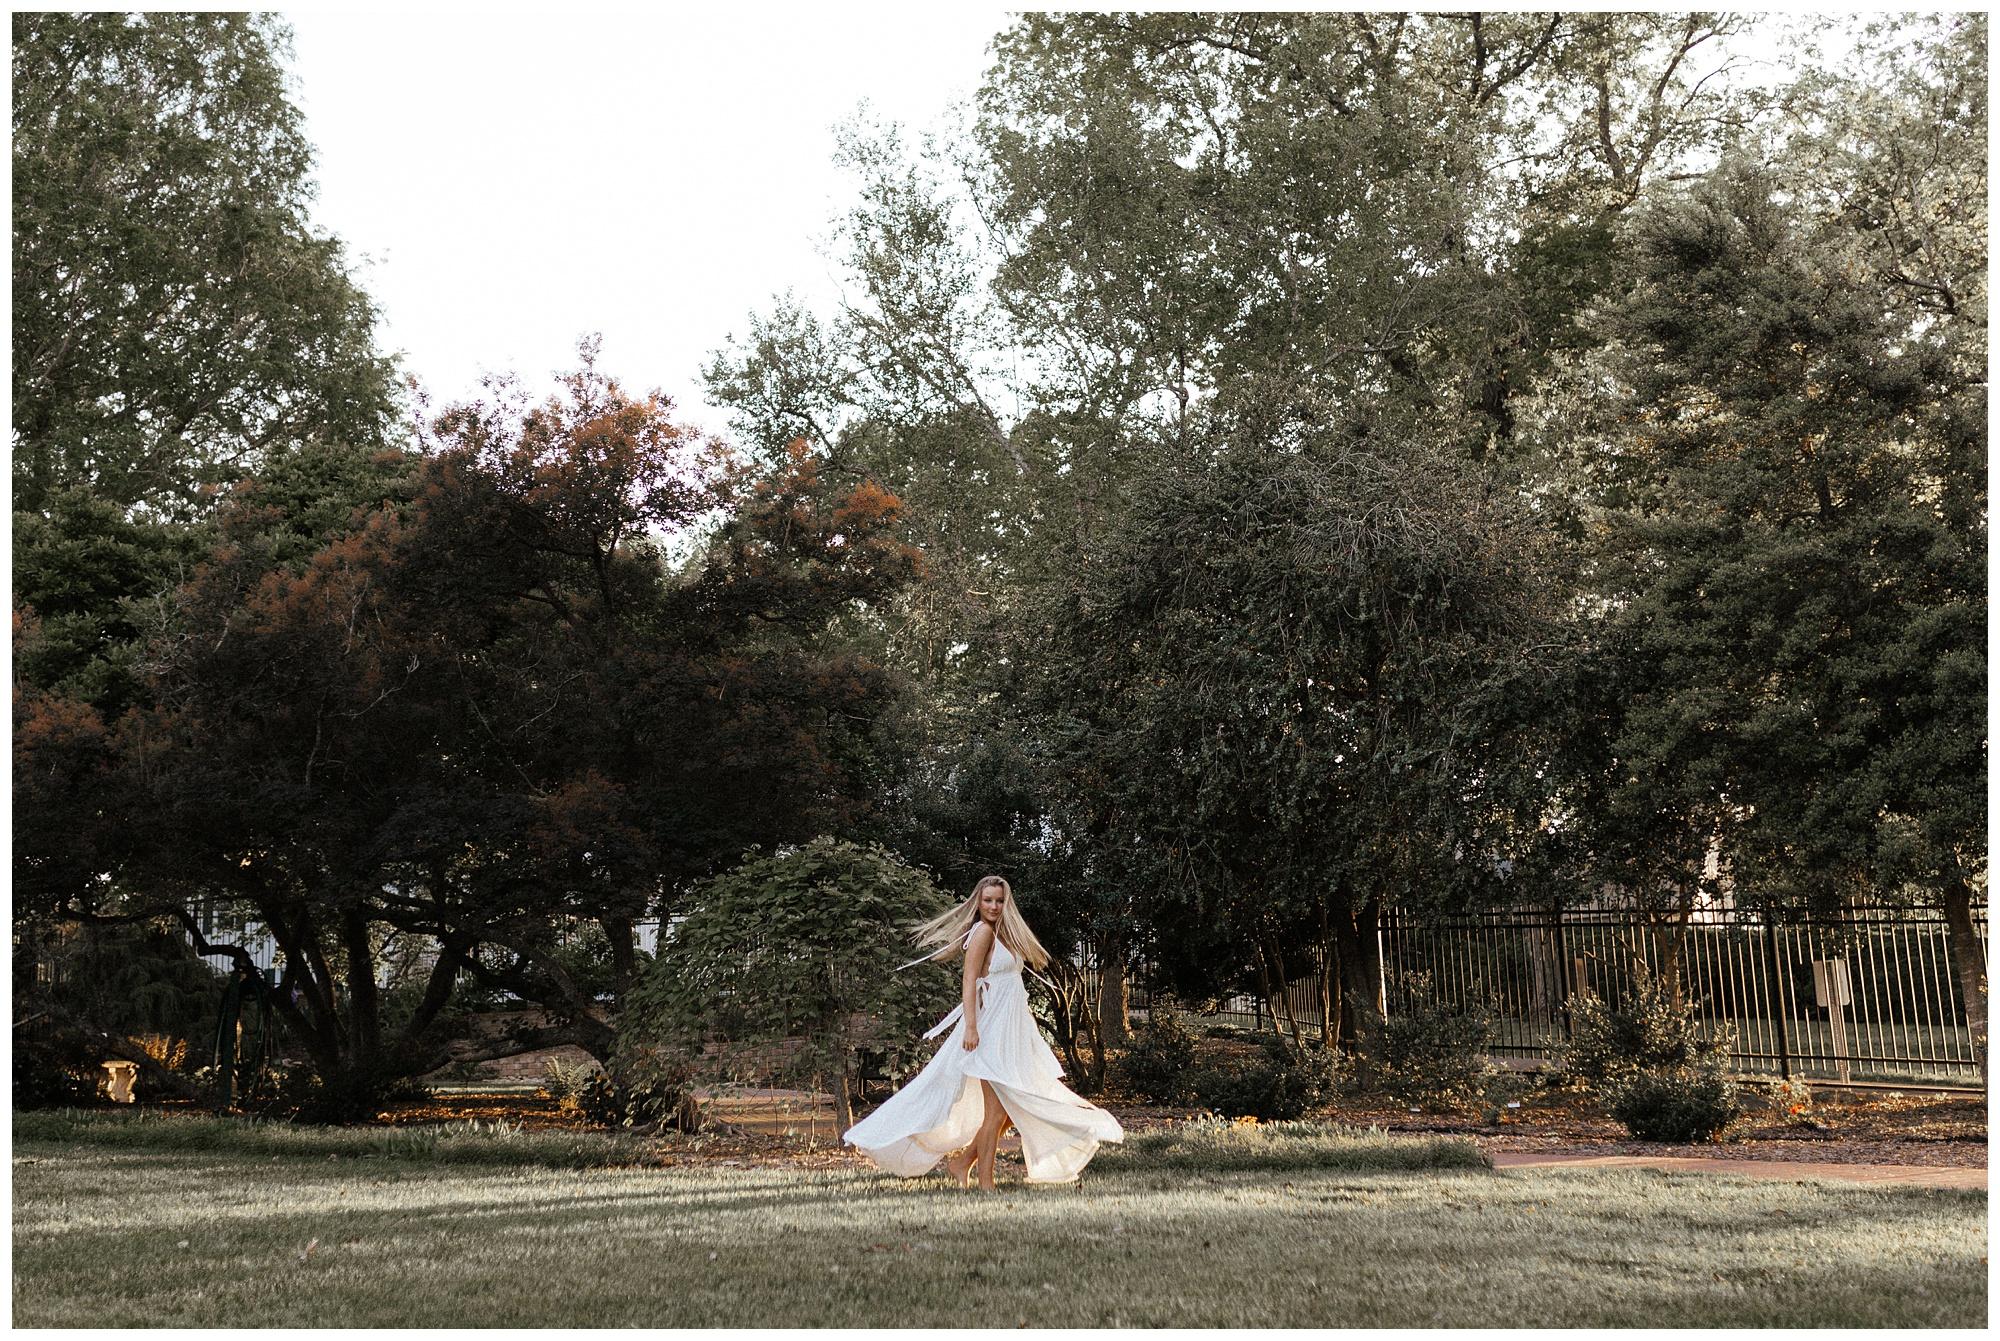 House-of-Ivy-Photography-North Carolina-Photographer-Tanglewood-Winston-Salem_0035.jpg